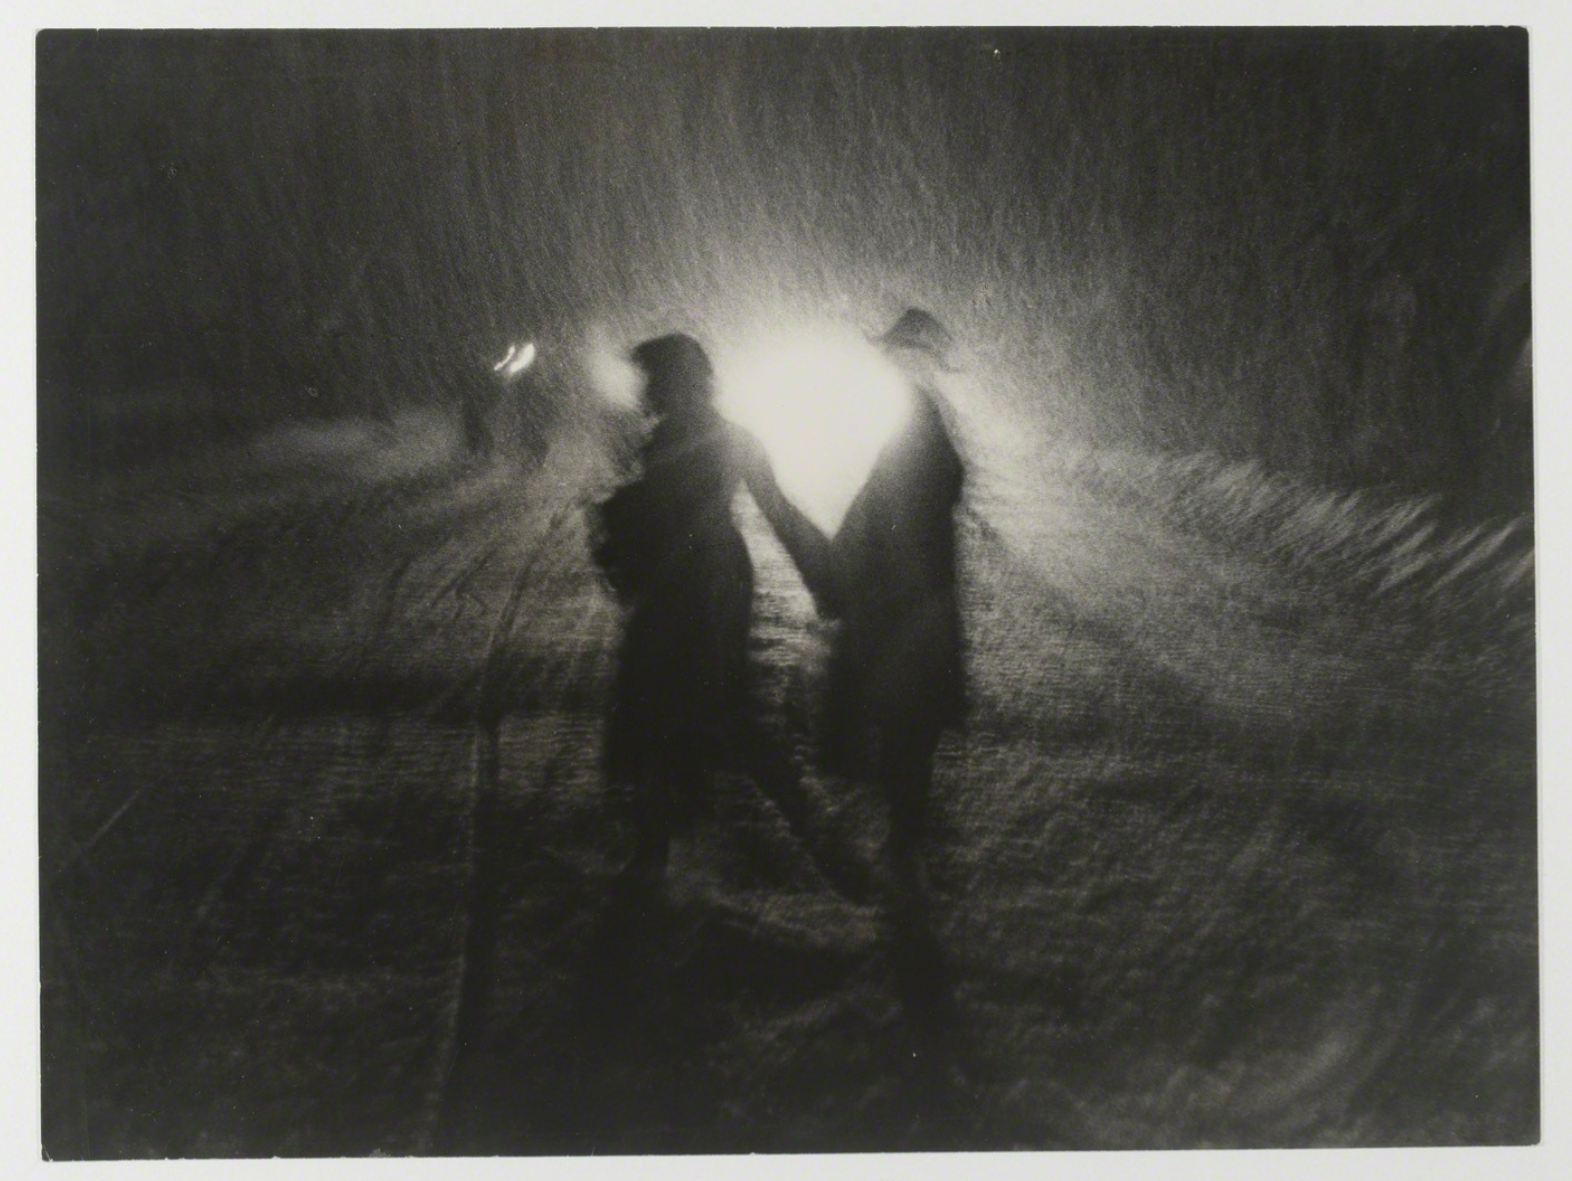 Gen Otsuka, Snow Fantasy (1953)